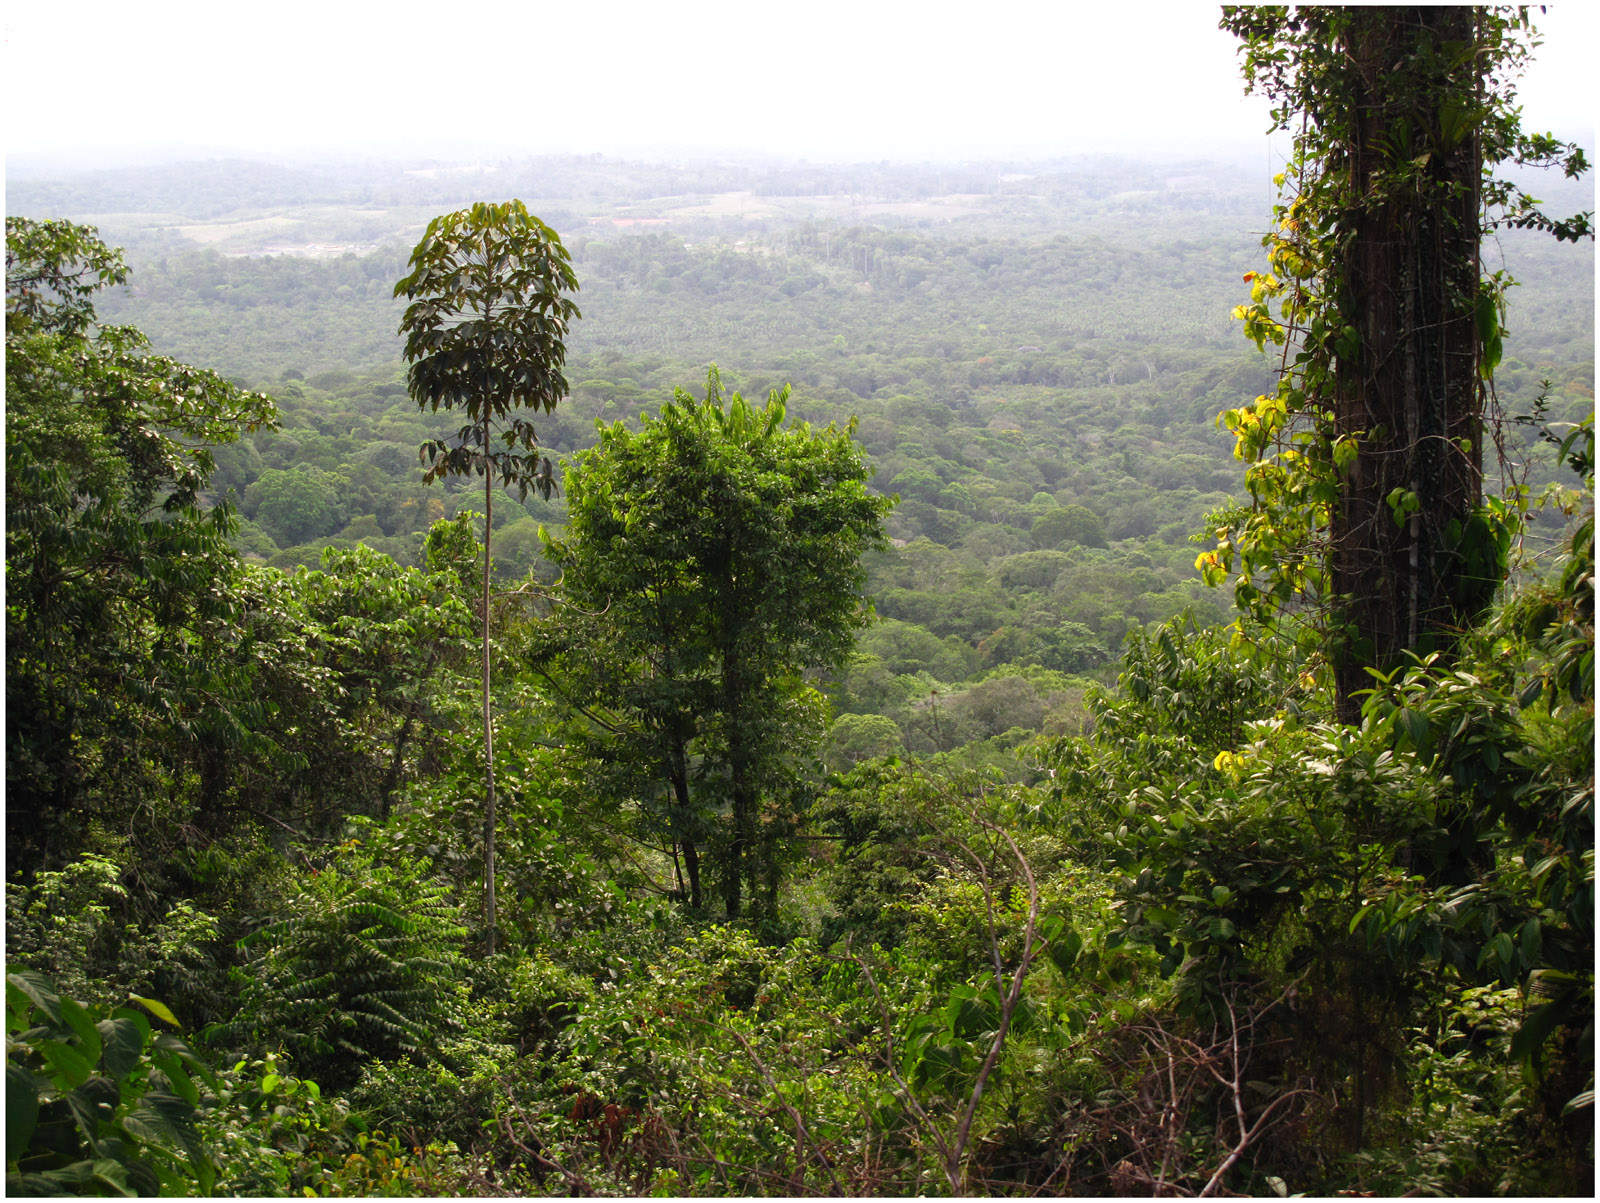 Cergipontin Montagnes De Roura (guyane)  La Canopée